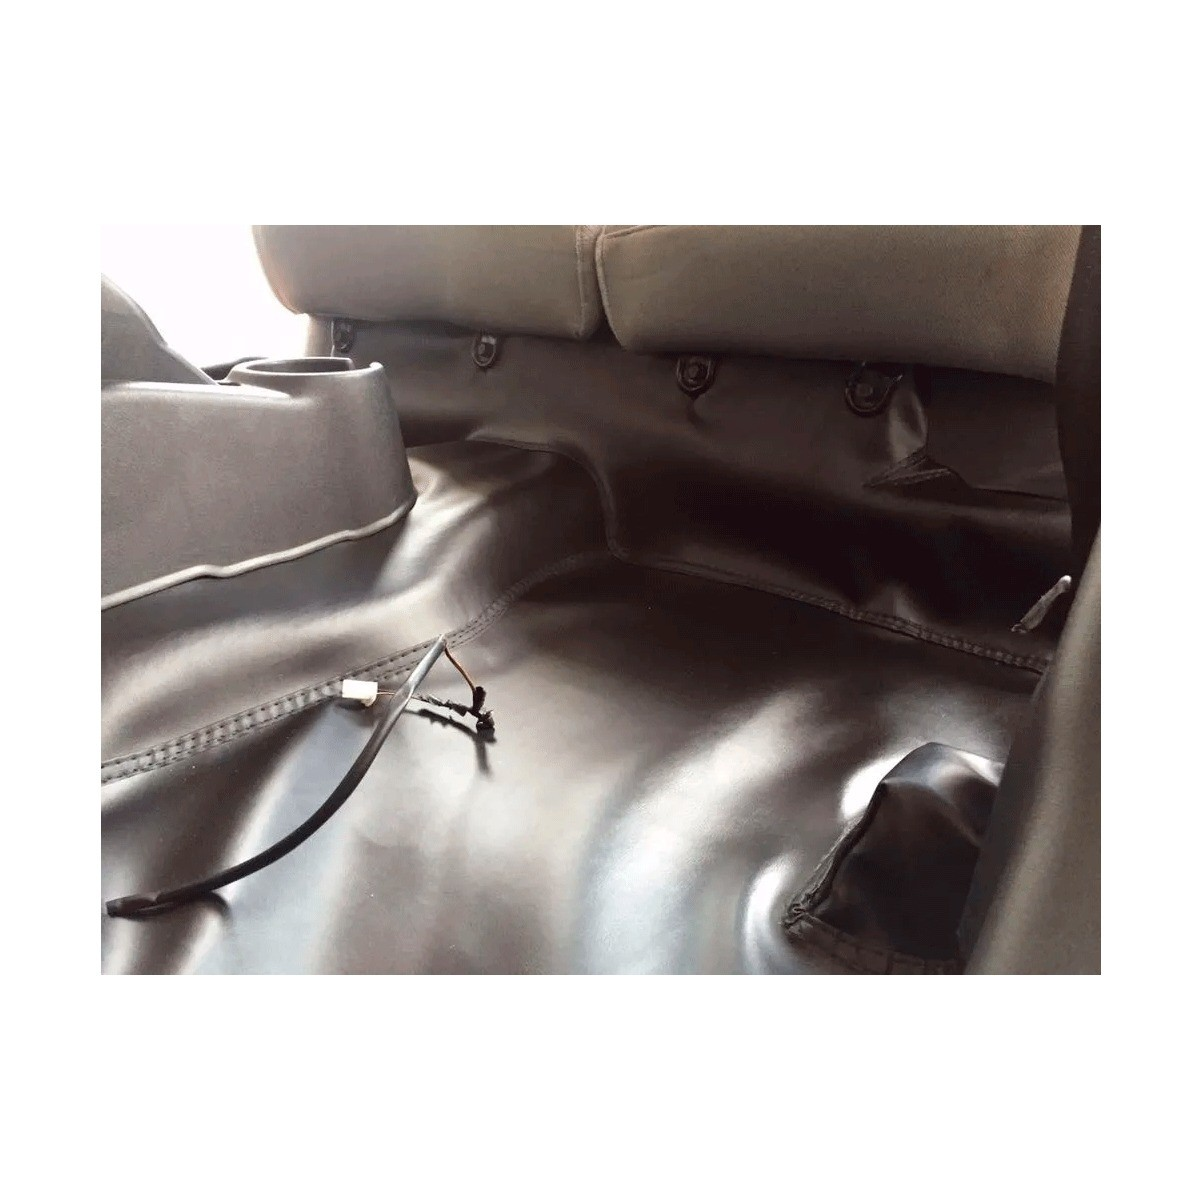 Tapete Automotivo Assoalho Emborrachado Bidim Ford Fiesta 2002 a 2004